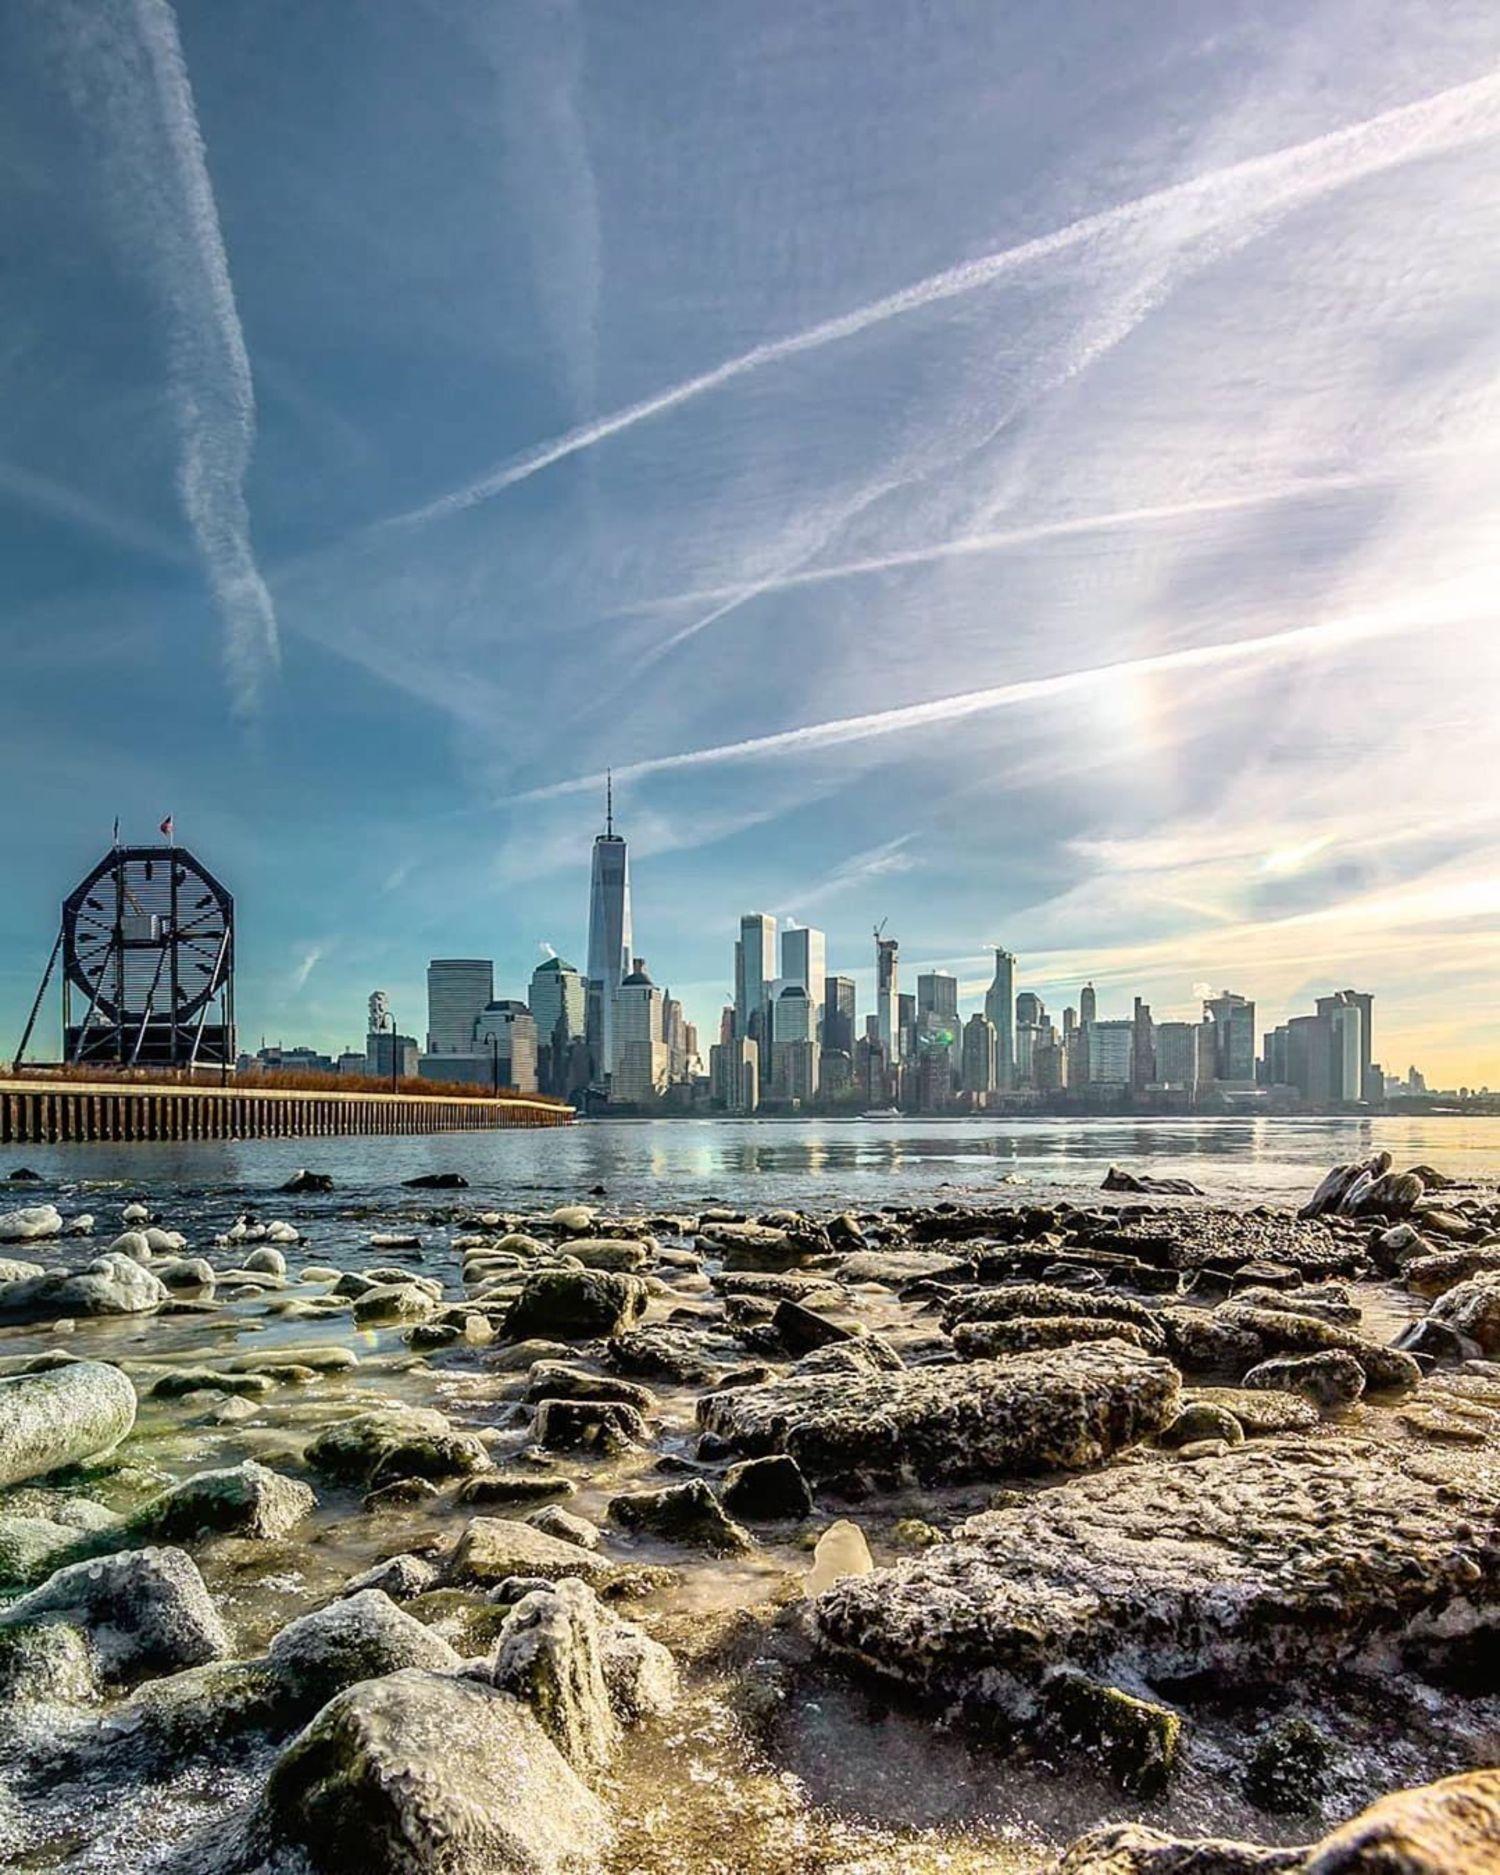 New York, New York. Photo via @everydayimshuttering #viewingnyc #nyc #newyork #newyorkcity